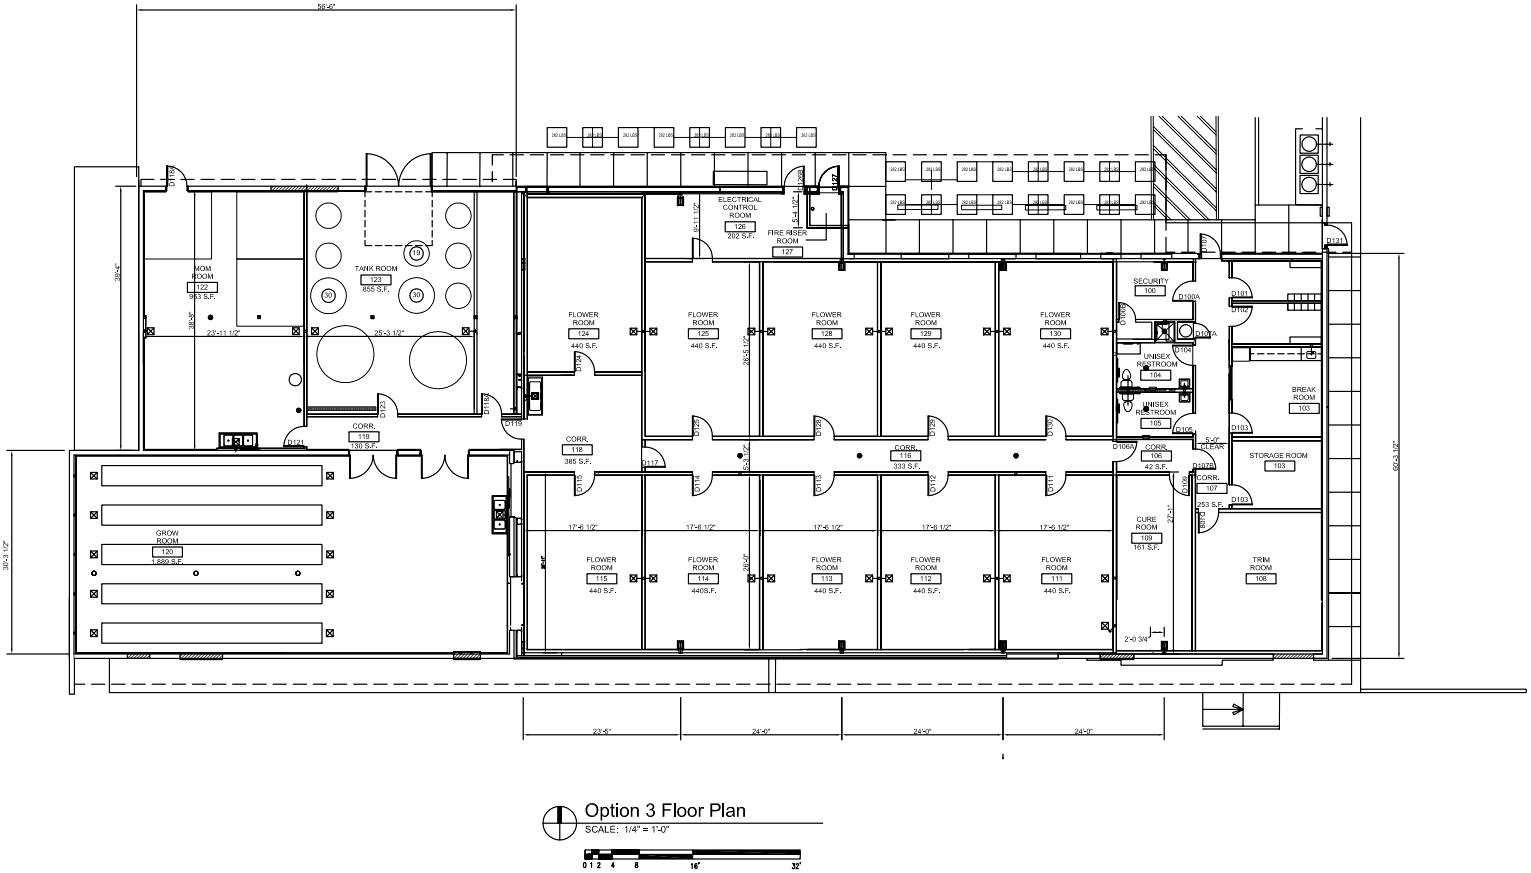 American green inc erbb latest erbb mj grow op updates for Grow room design plans